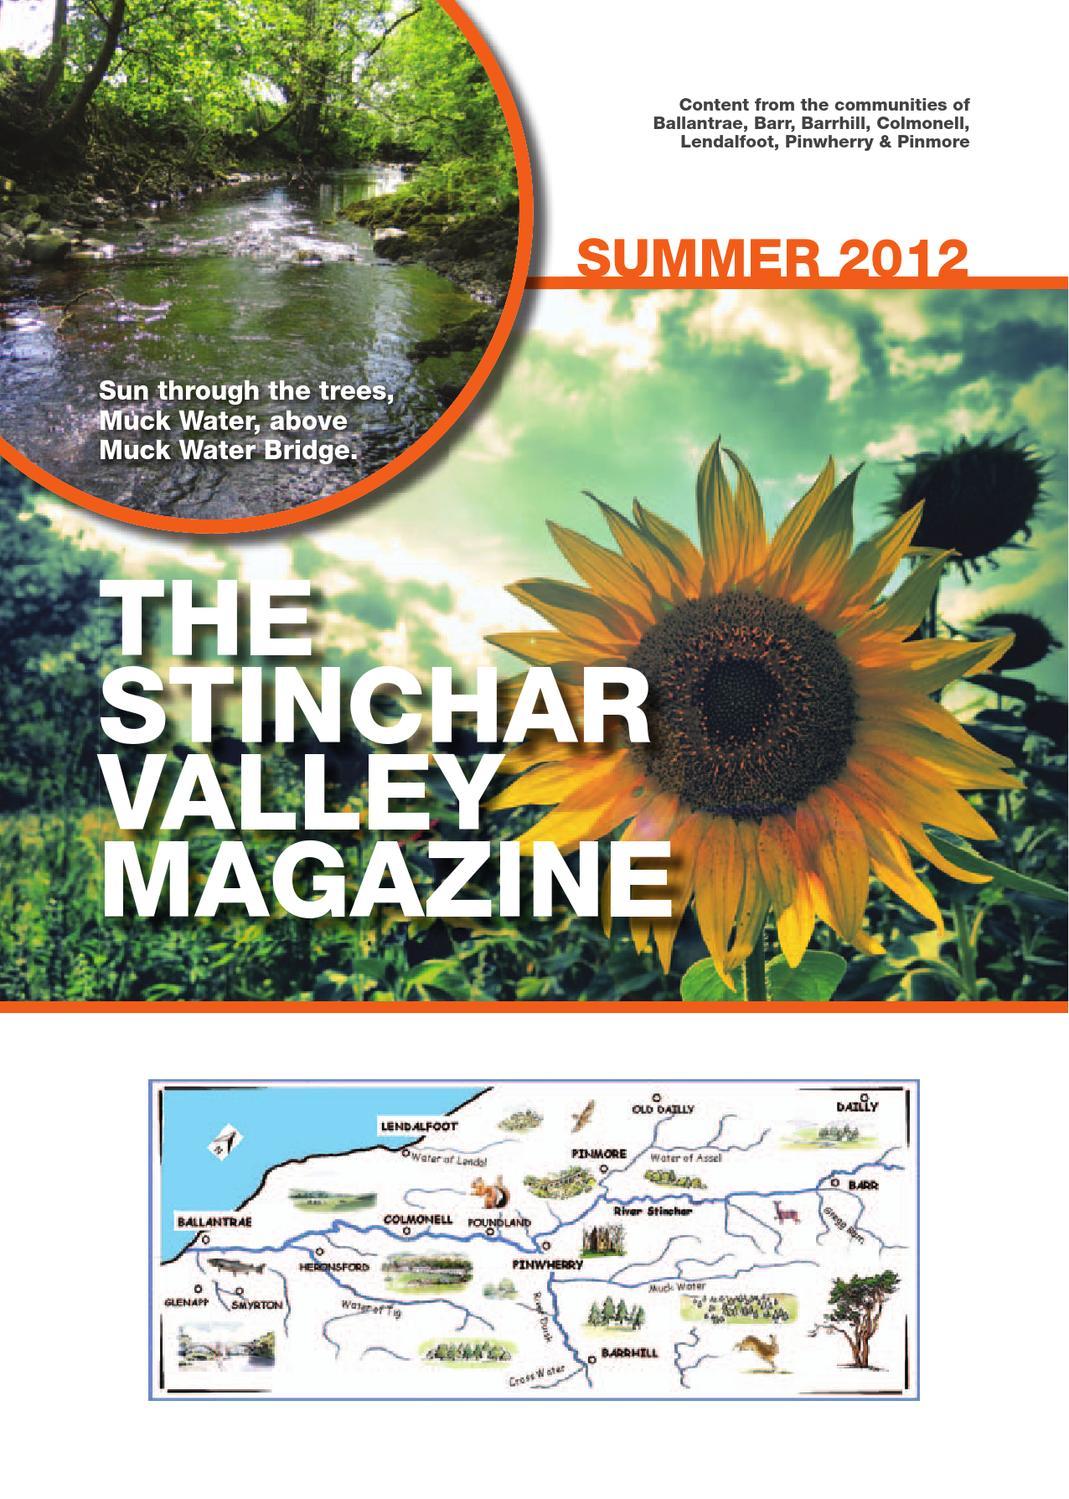 Marvelous Stinchar Valley Magazine Summer 2012 By Stephen Ogston Issuu Andrewgaddart Wooden Chair Designs For Living Room Andrewgaddartcom